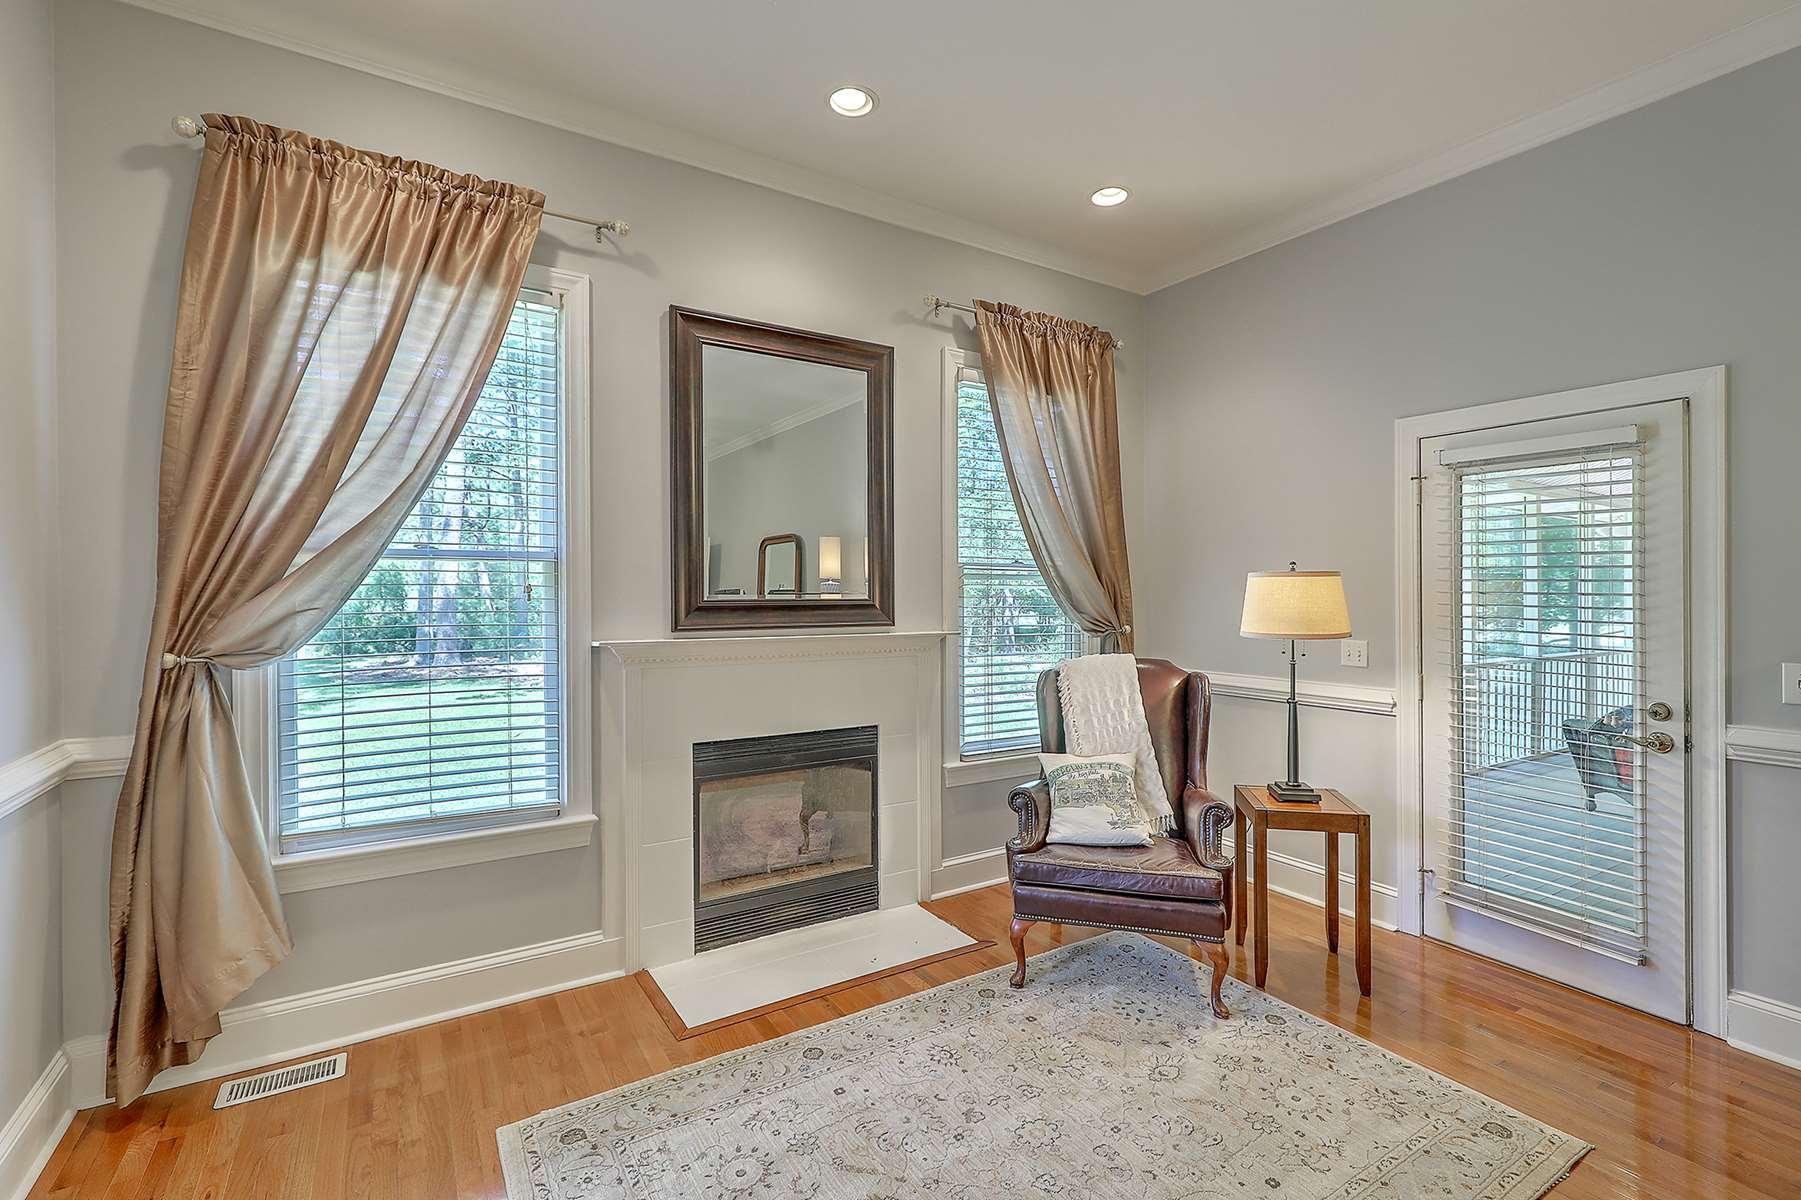 Dunes West Homes For Sale - 2961 Pignatelli, Mount Pleasant, SC - 13